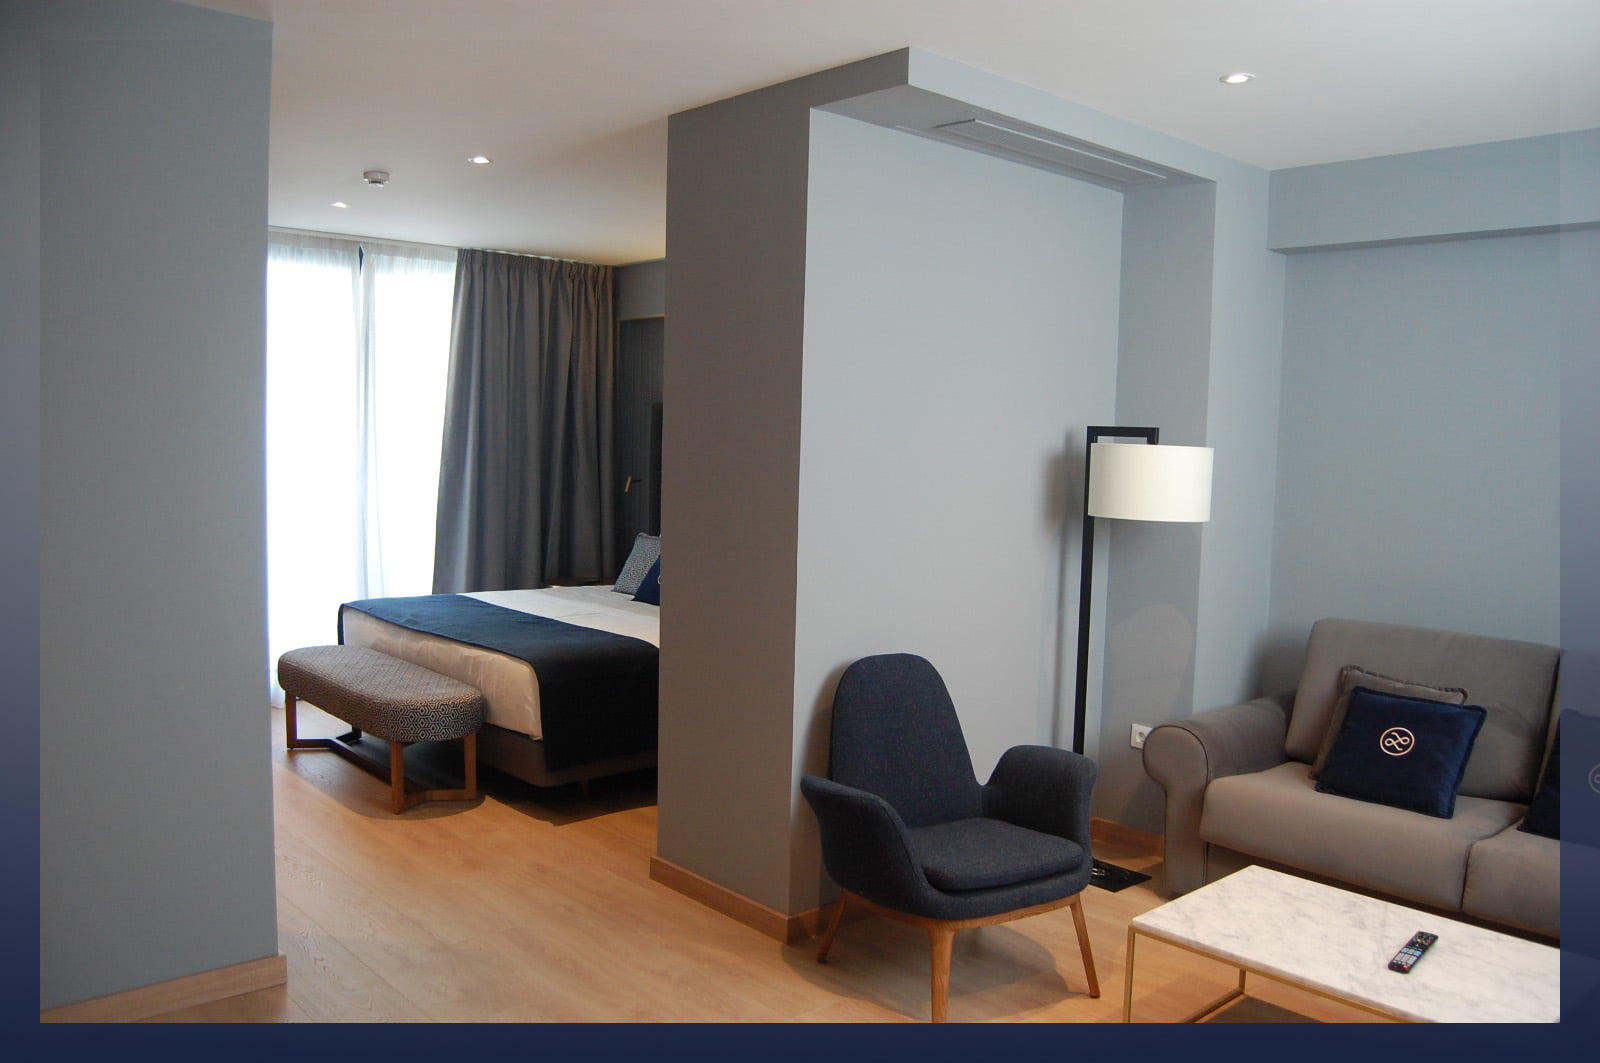 Lima Hotel Marbella Image 3